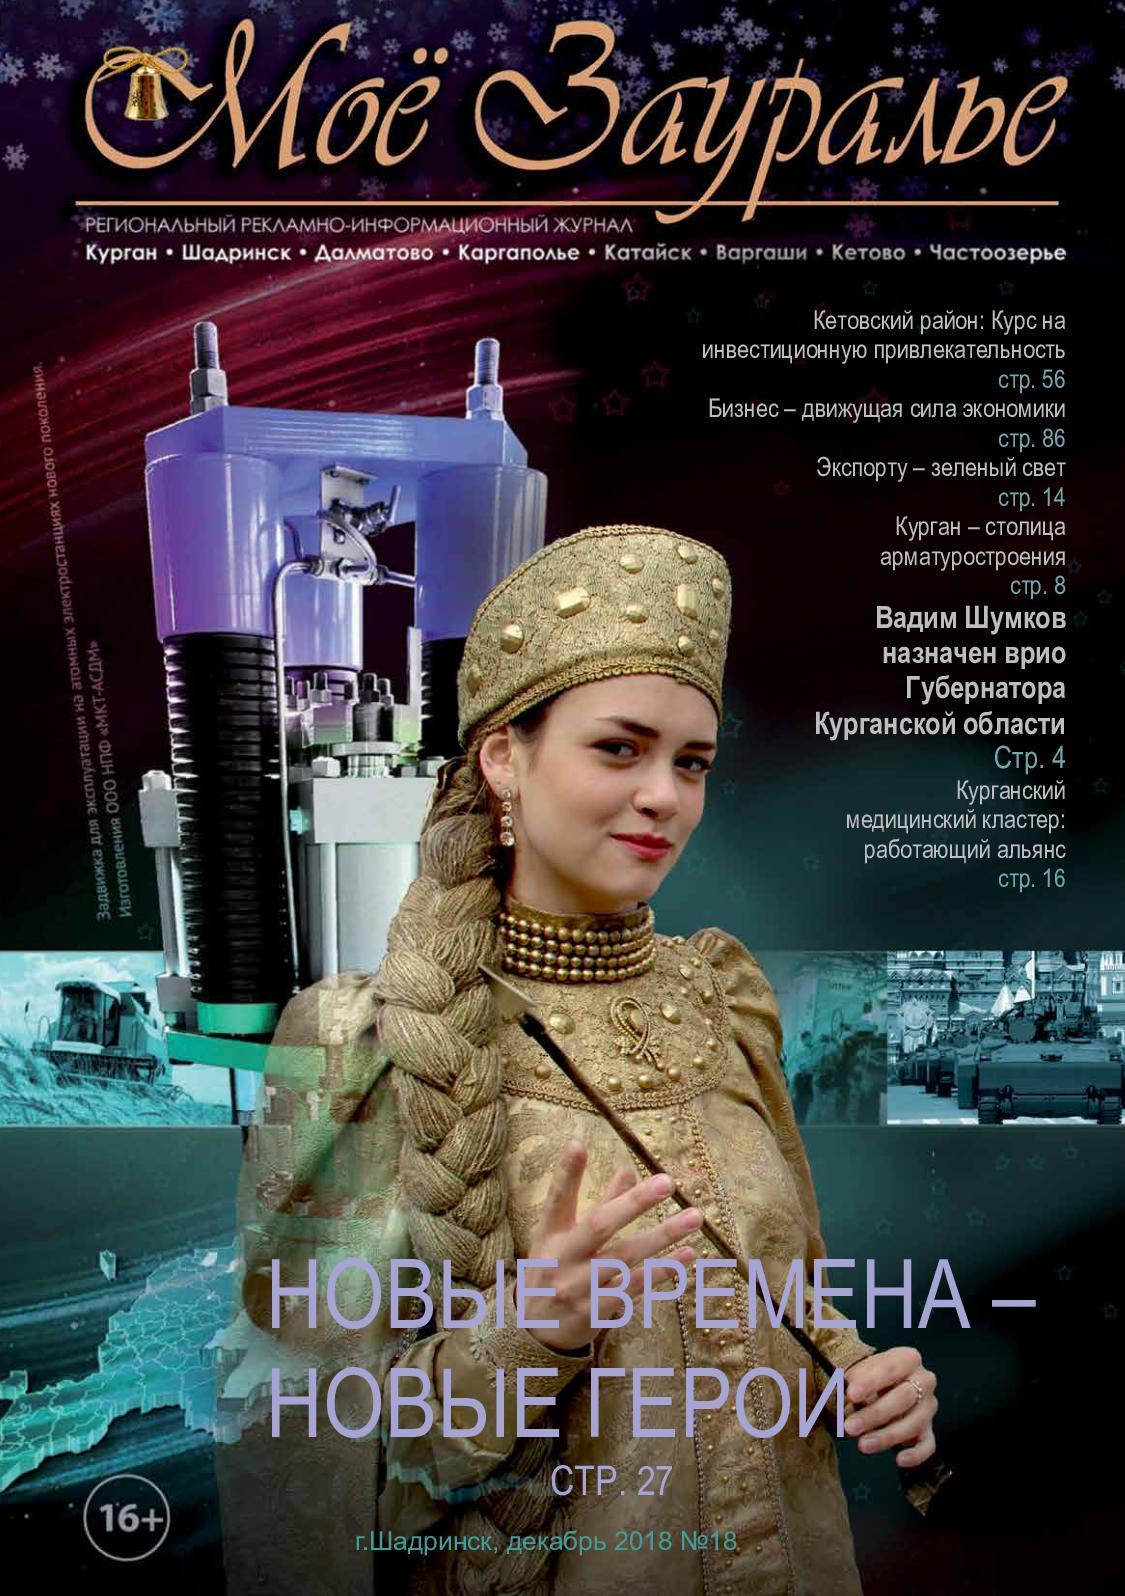 Елена Бирюкова Отдыхает На Природе – Саша + Маша (2002)